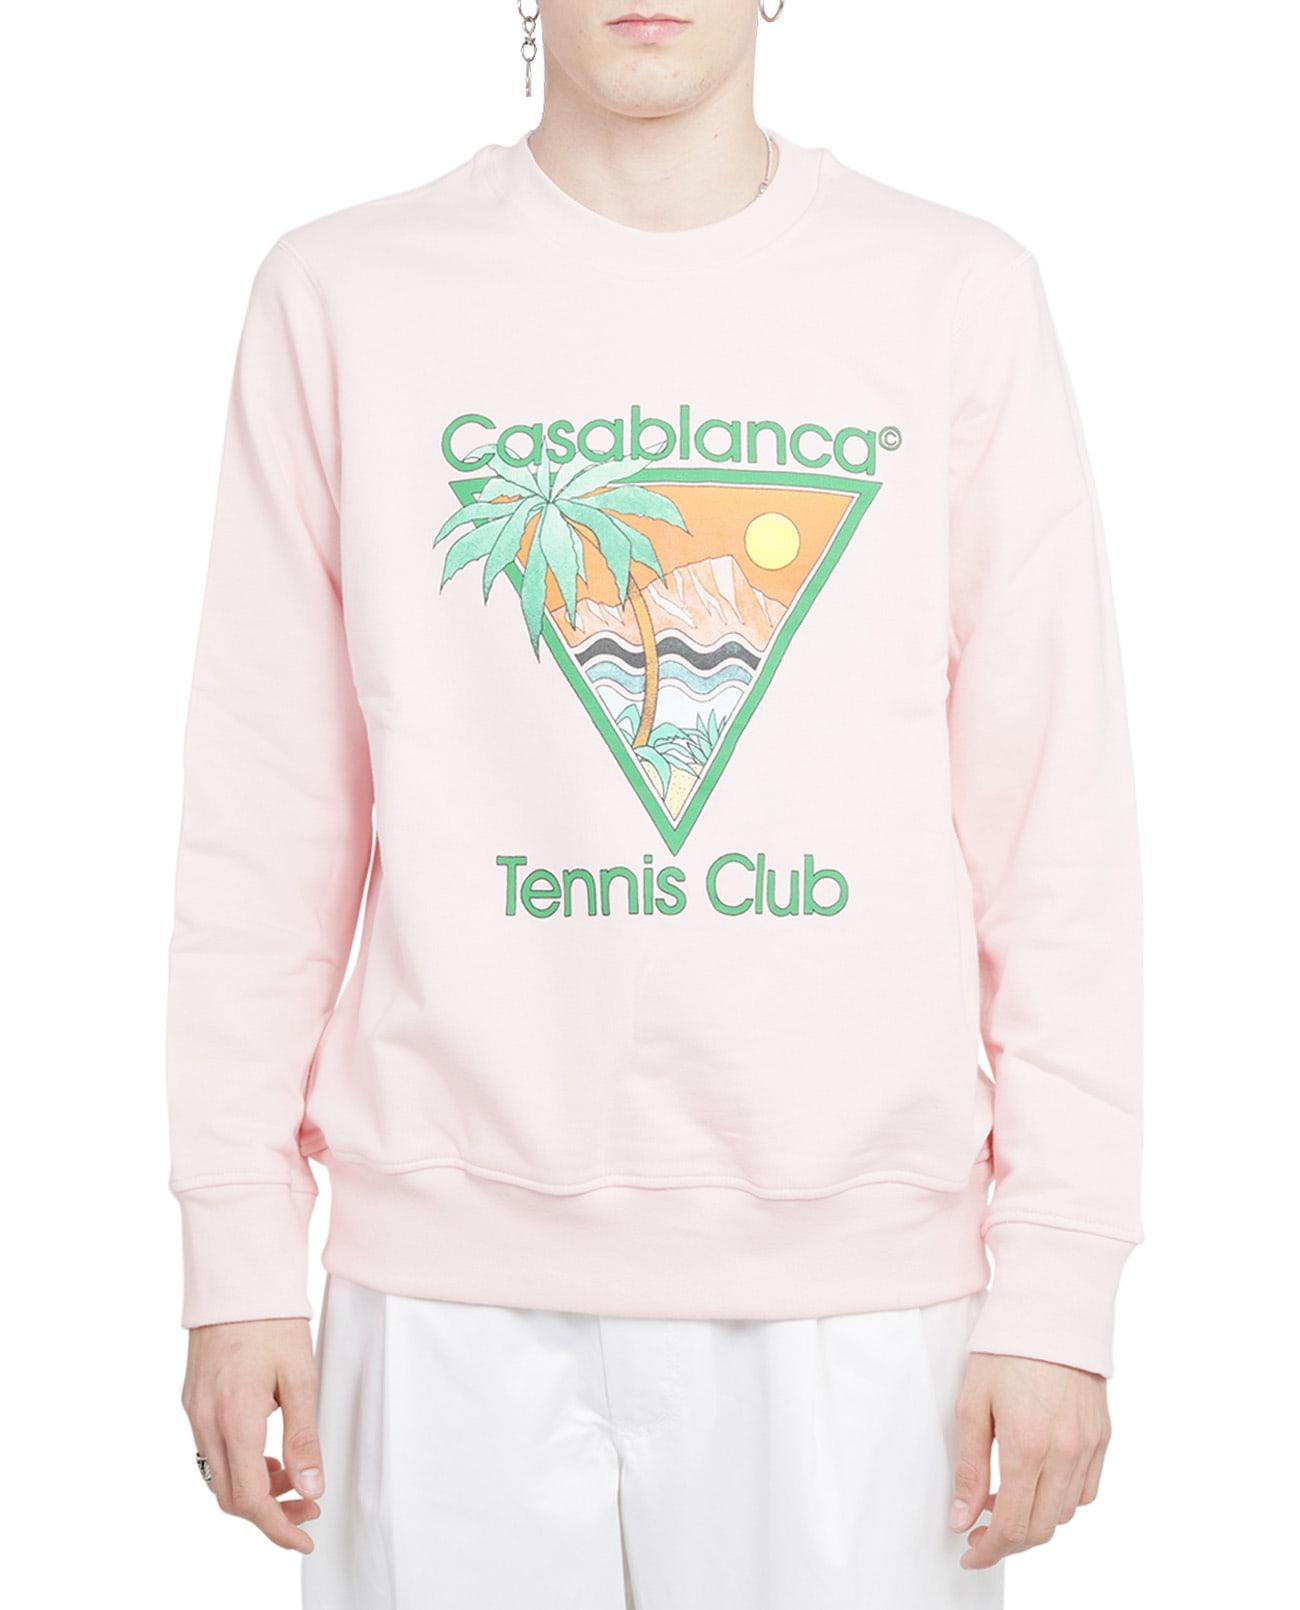 Casablanca Sweatshirts PINK TENNIS CLUB ICON SWEATSHIRT